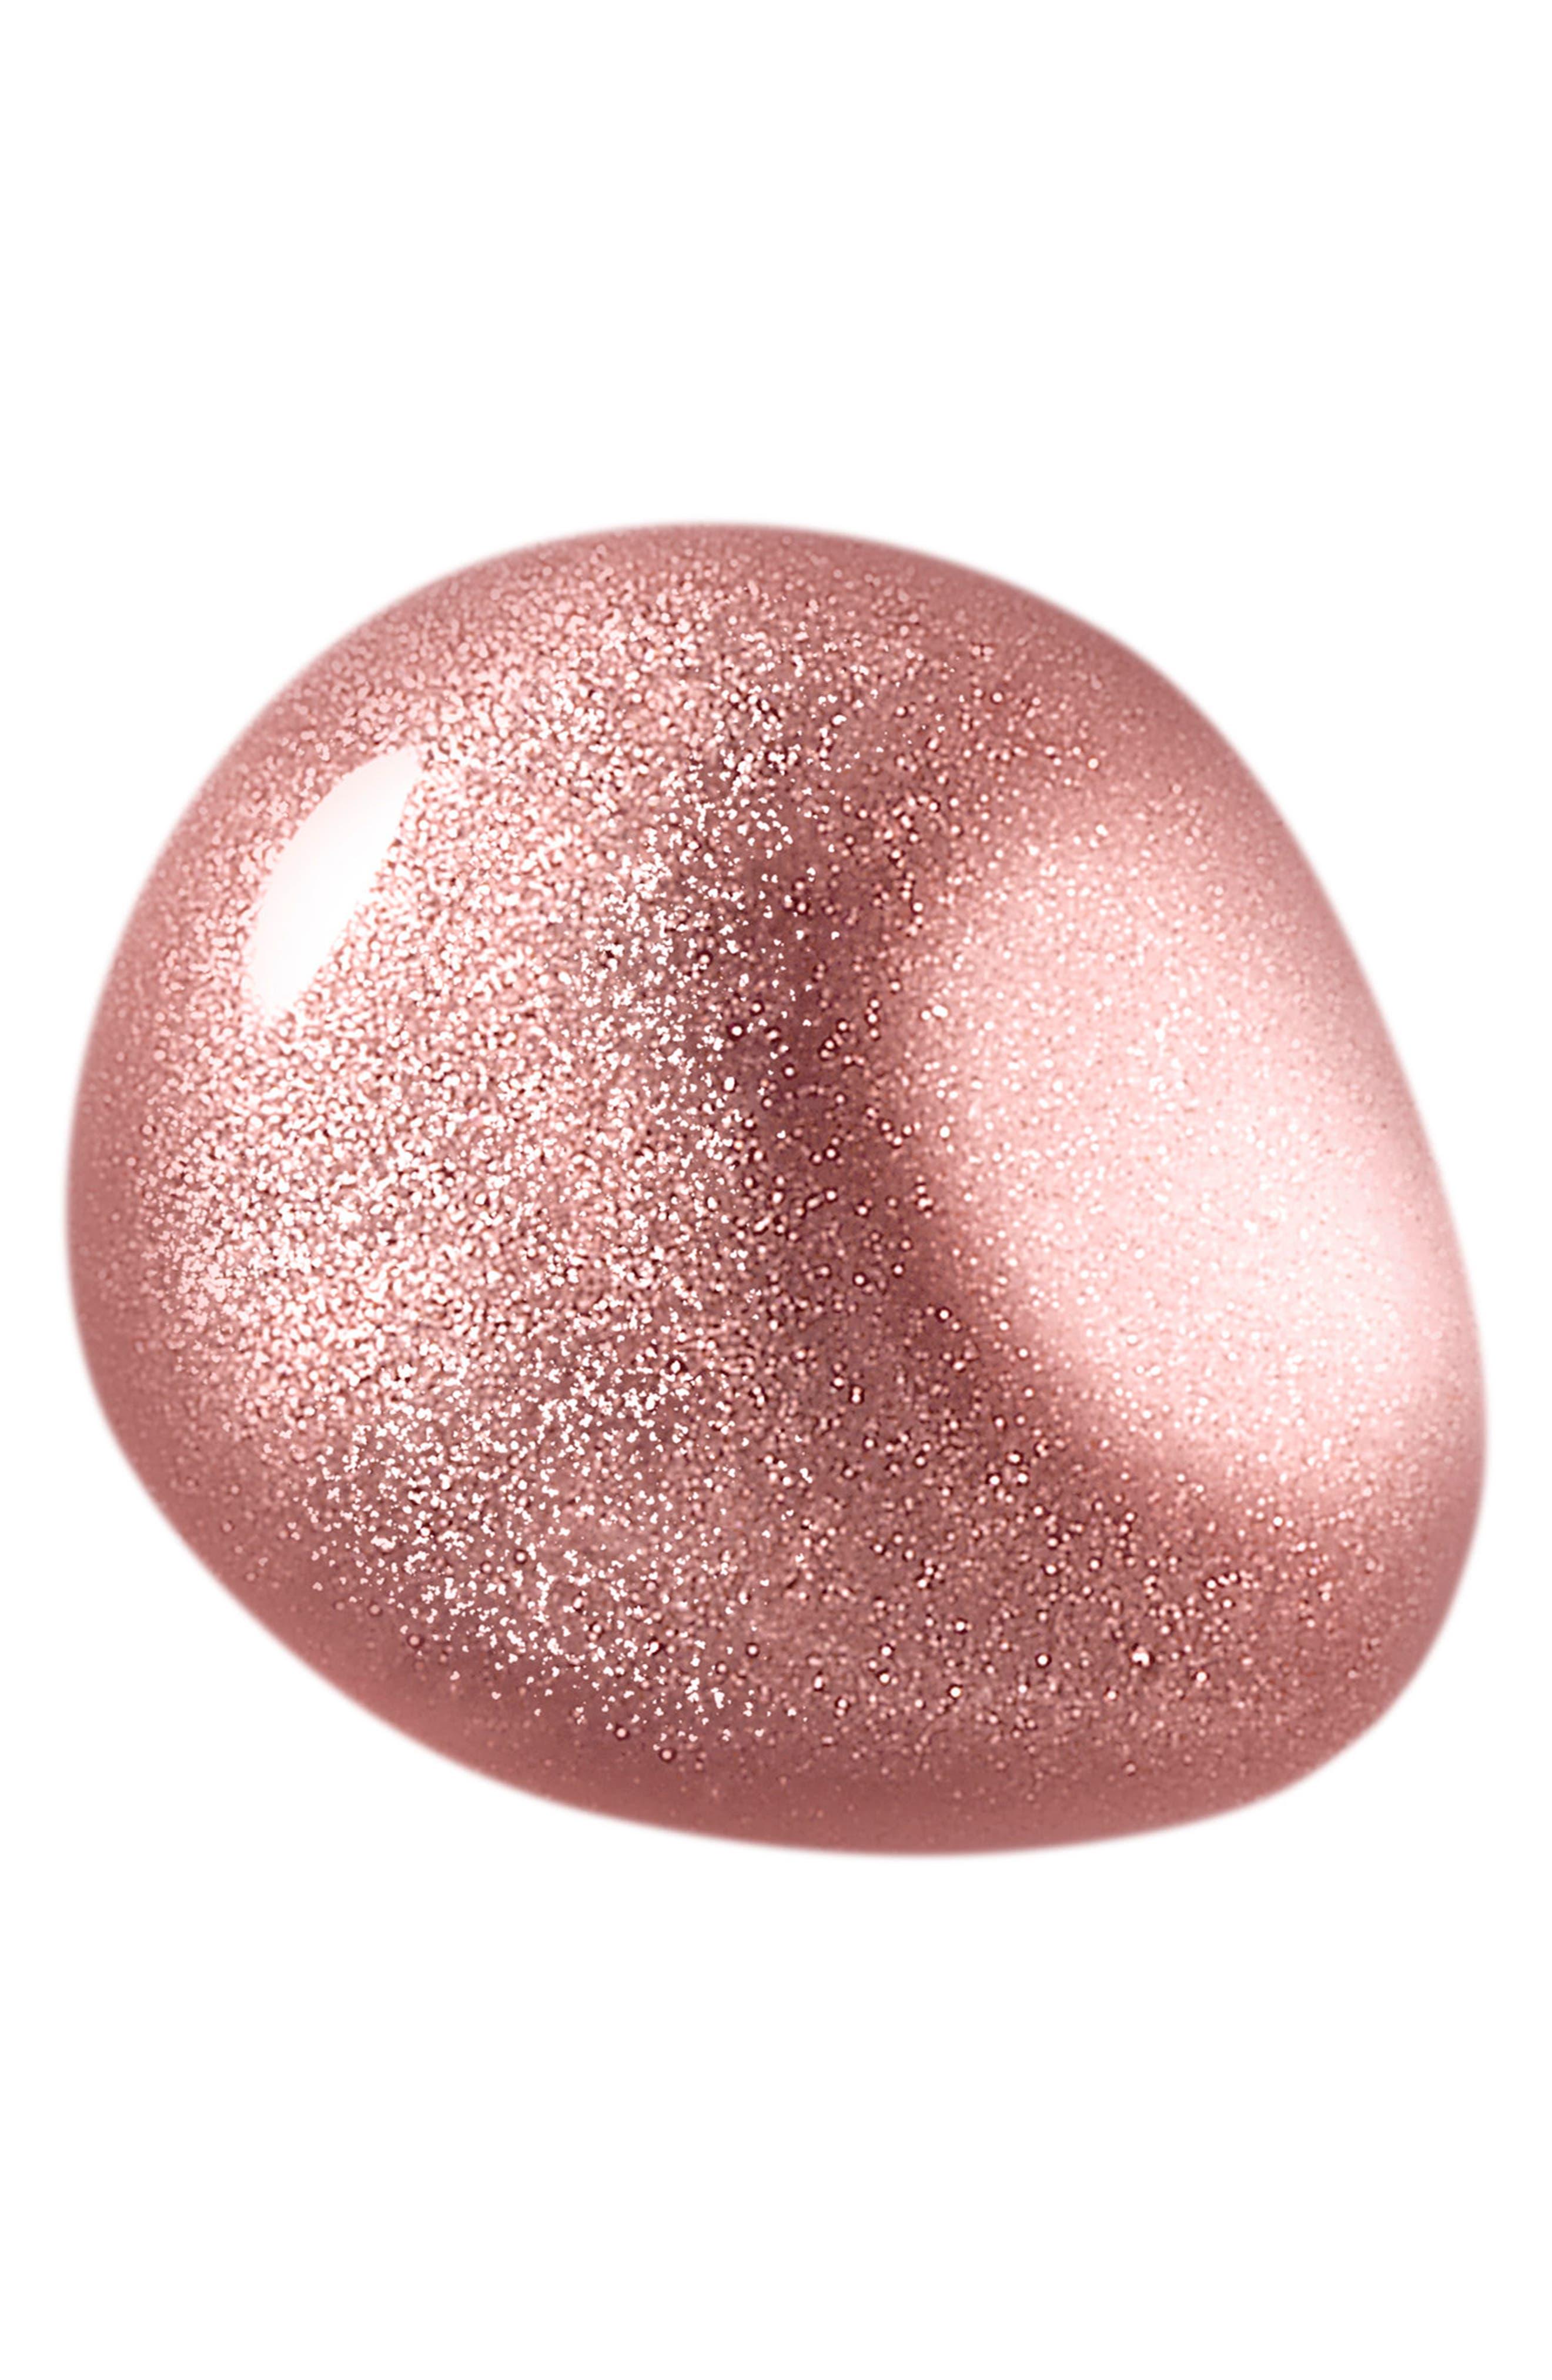 Shimmer Lip Gloss,                             Alternate thumbnail 2, color,                             Rose Sugar